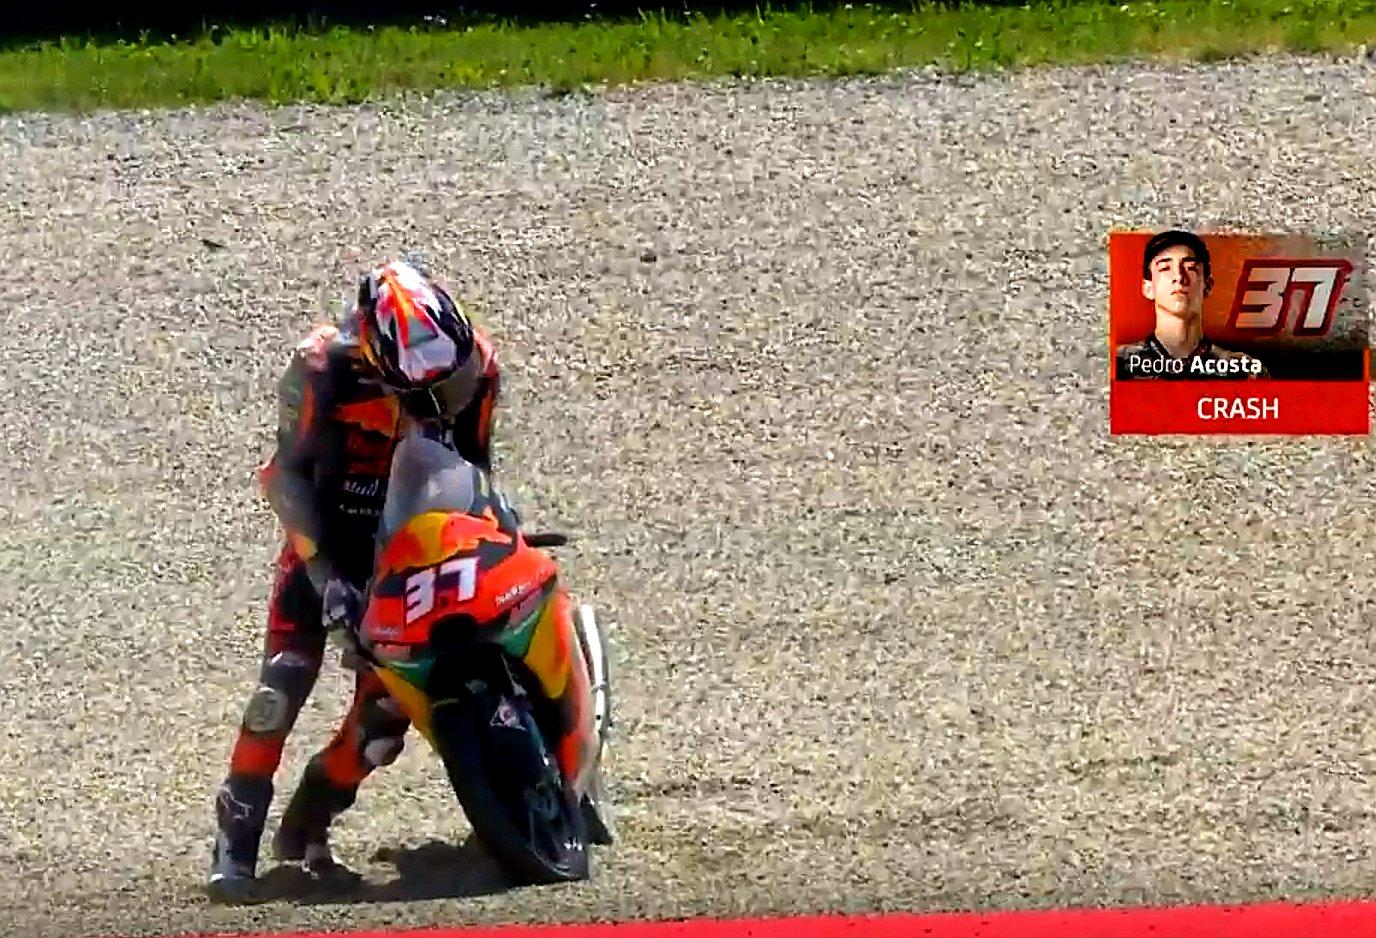 Moto GP 2021 - Page 16 E2eYH3mXEAIAGnl?format=jpg&name=large